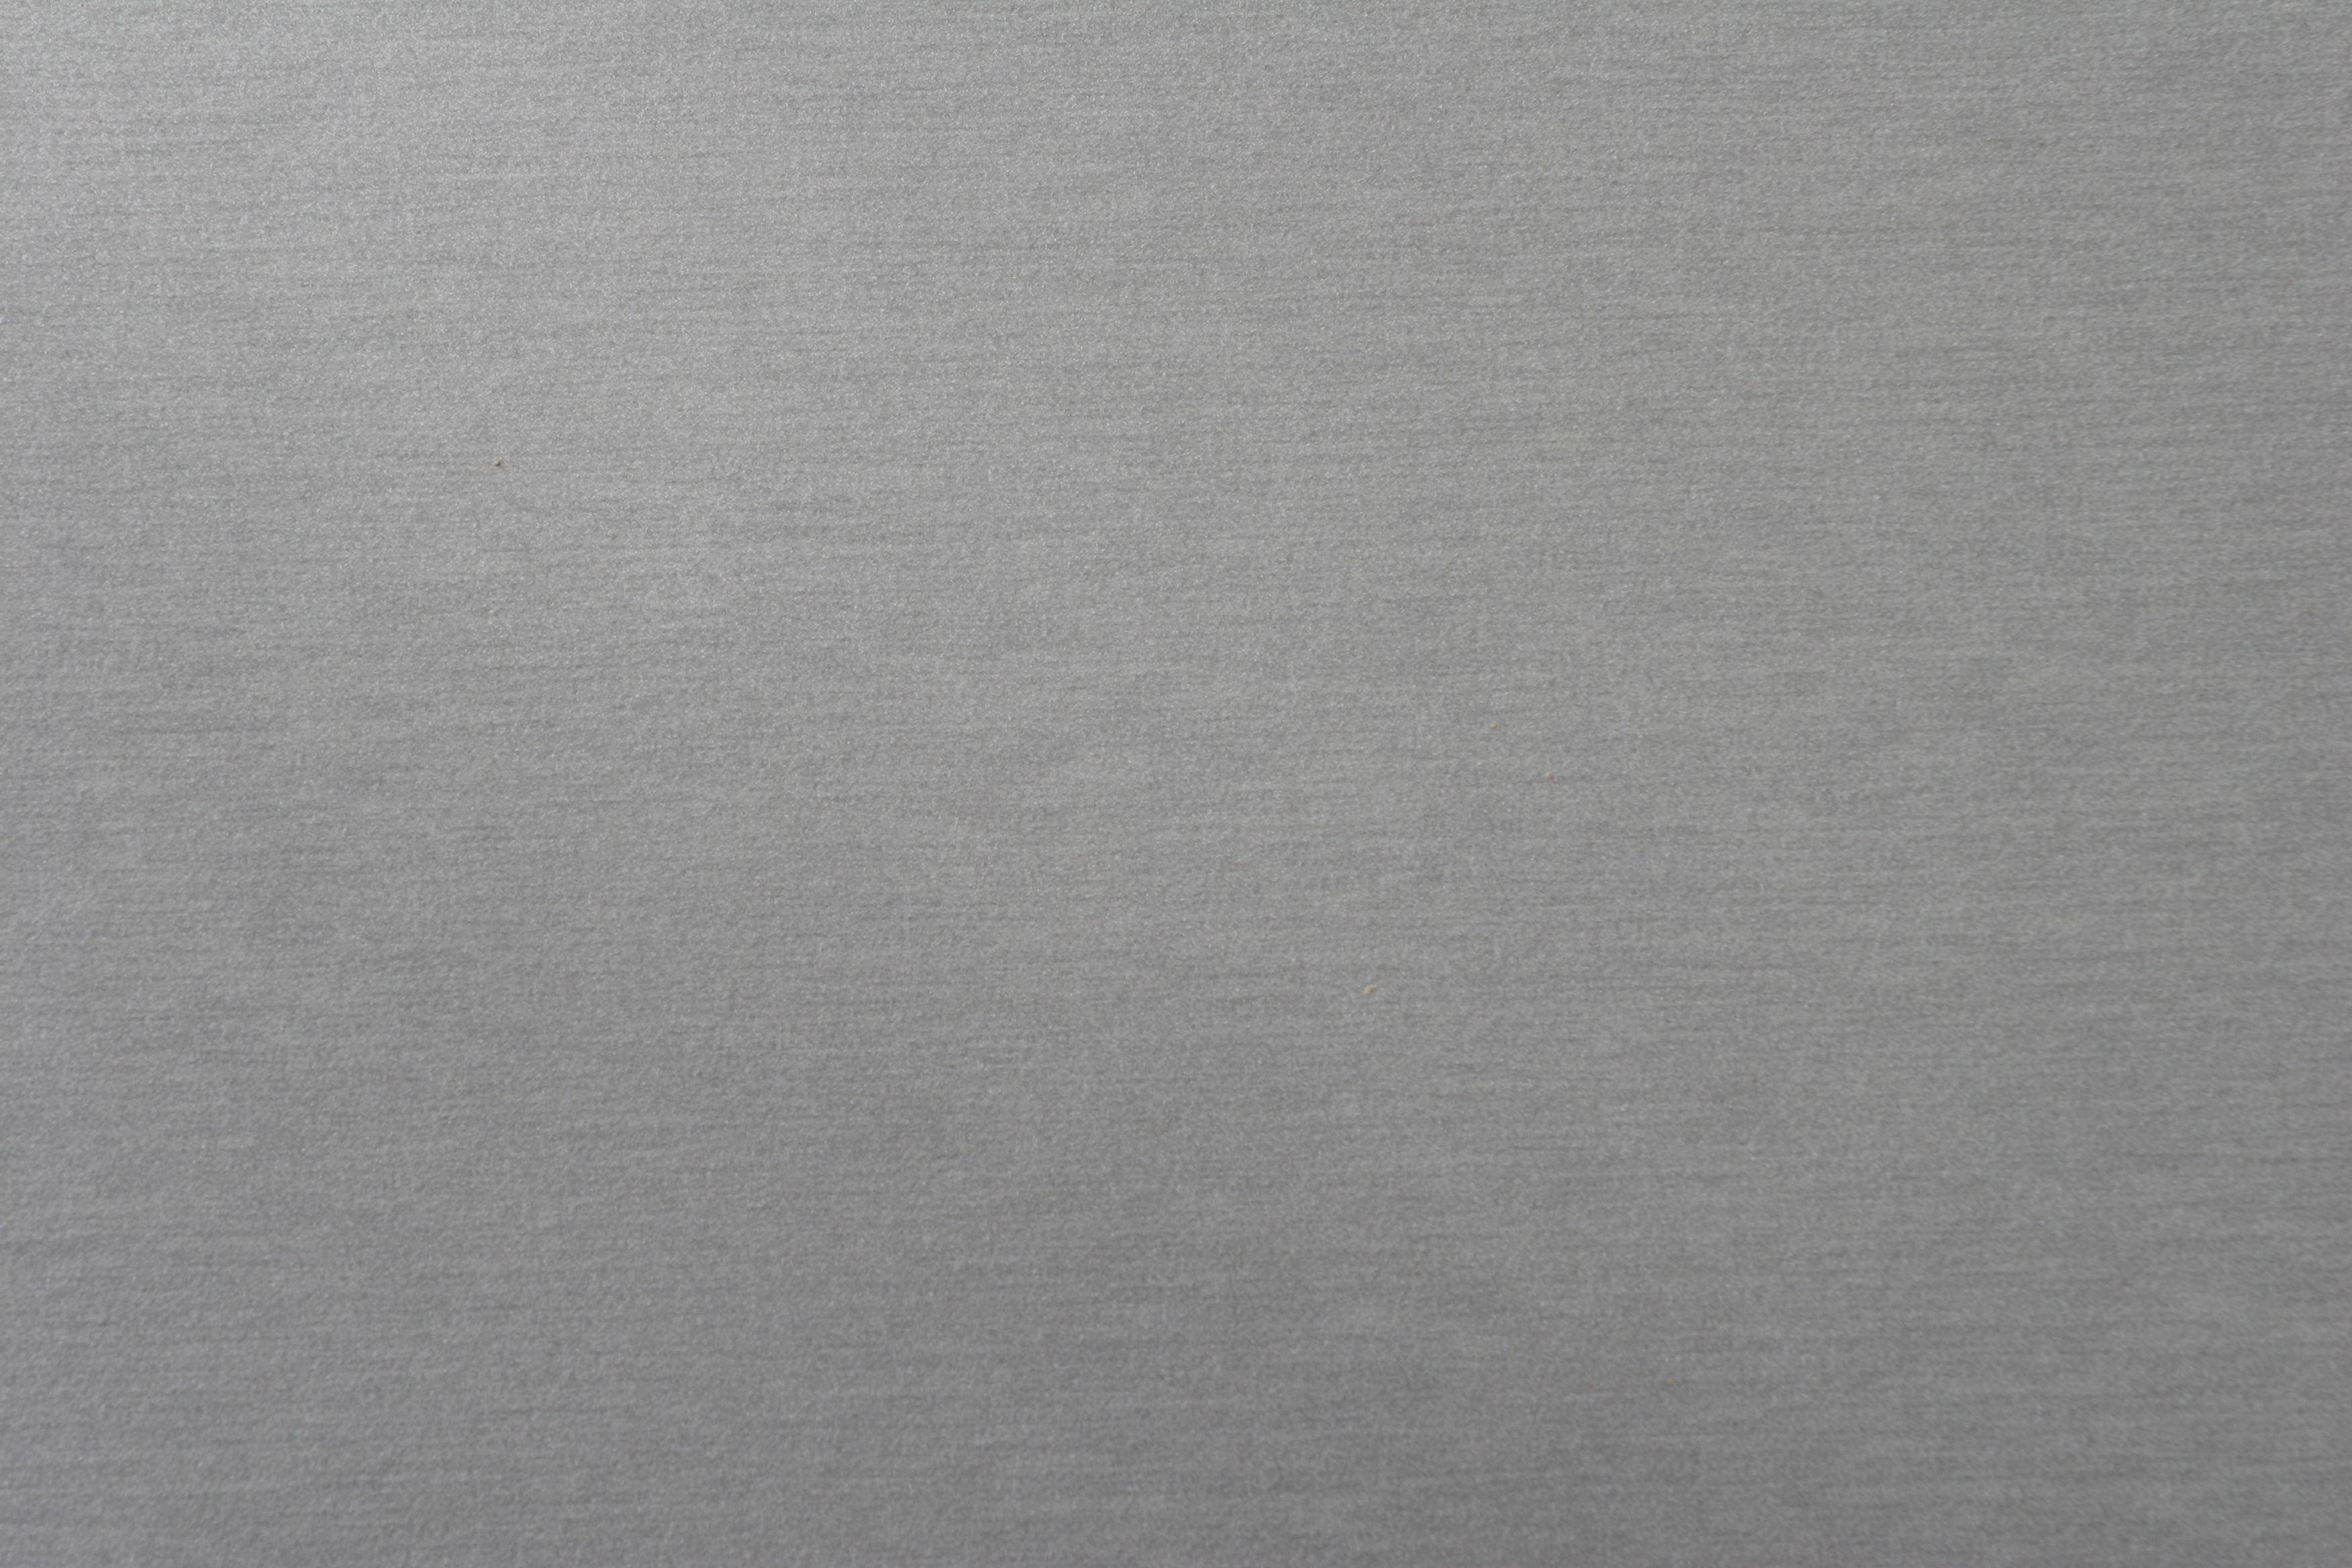 aluminum texture background download aluminum texture background 3504x2336